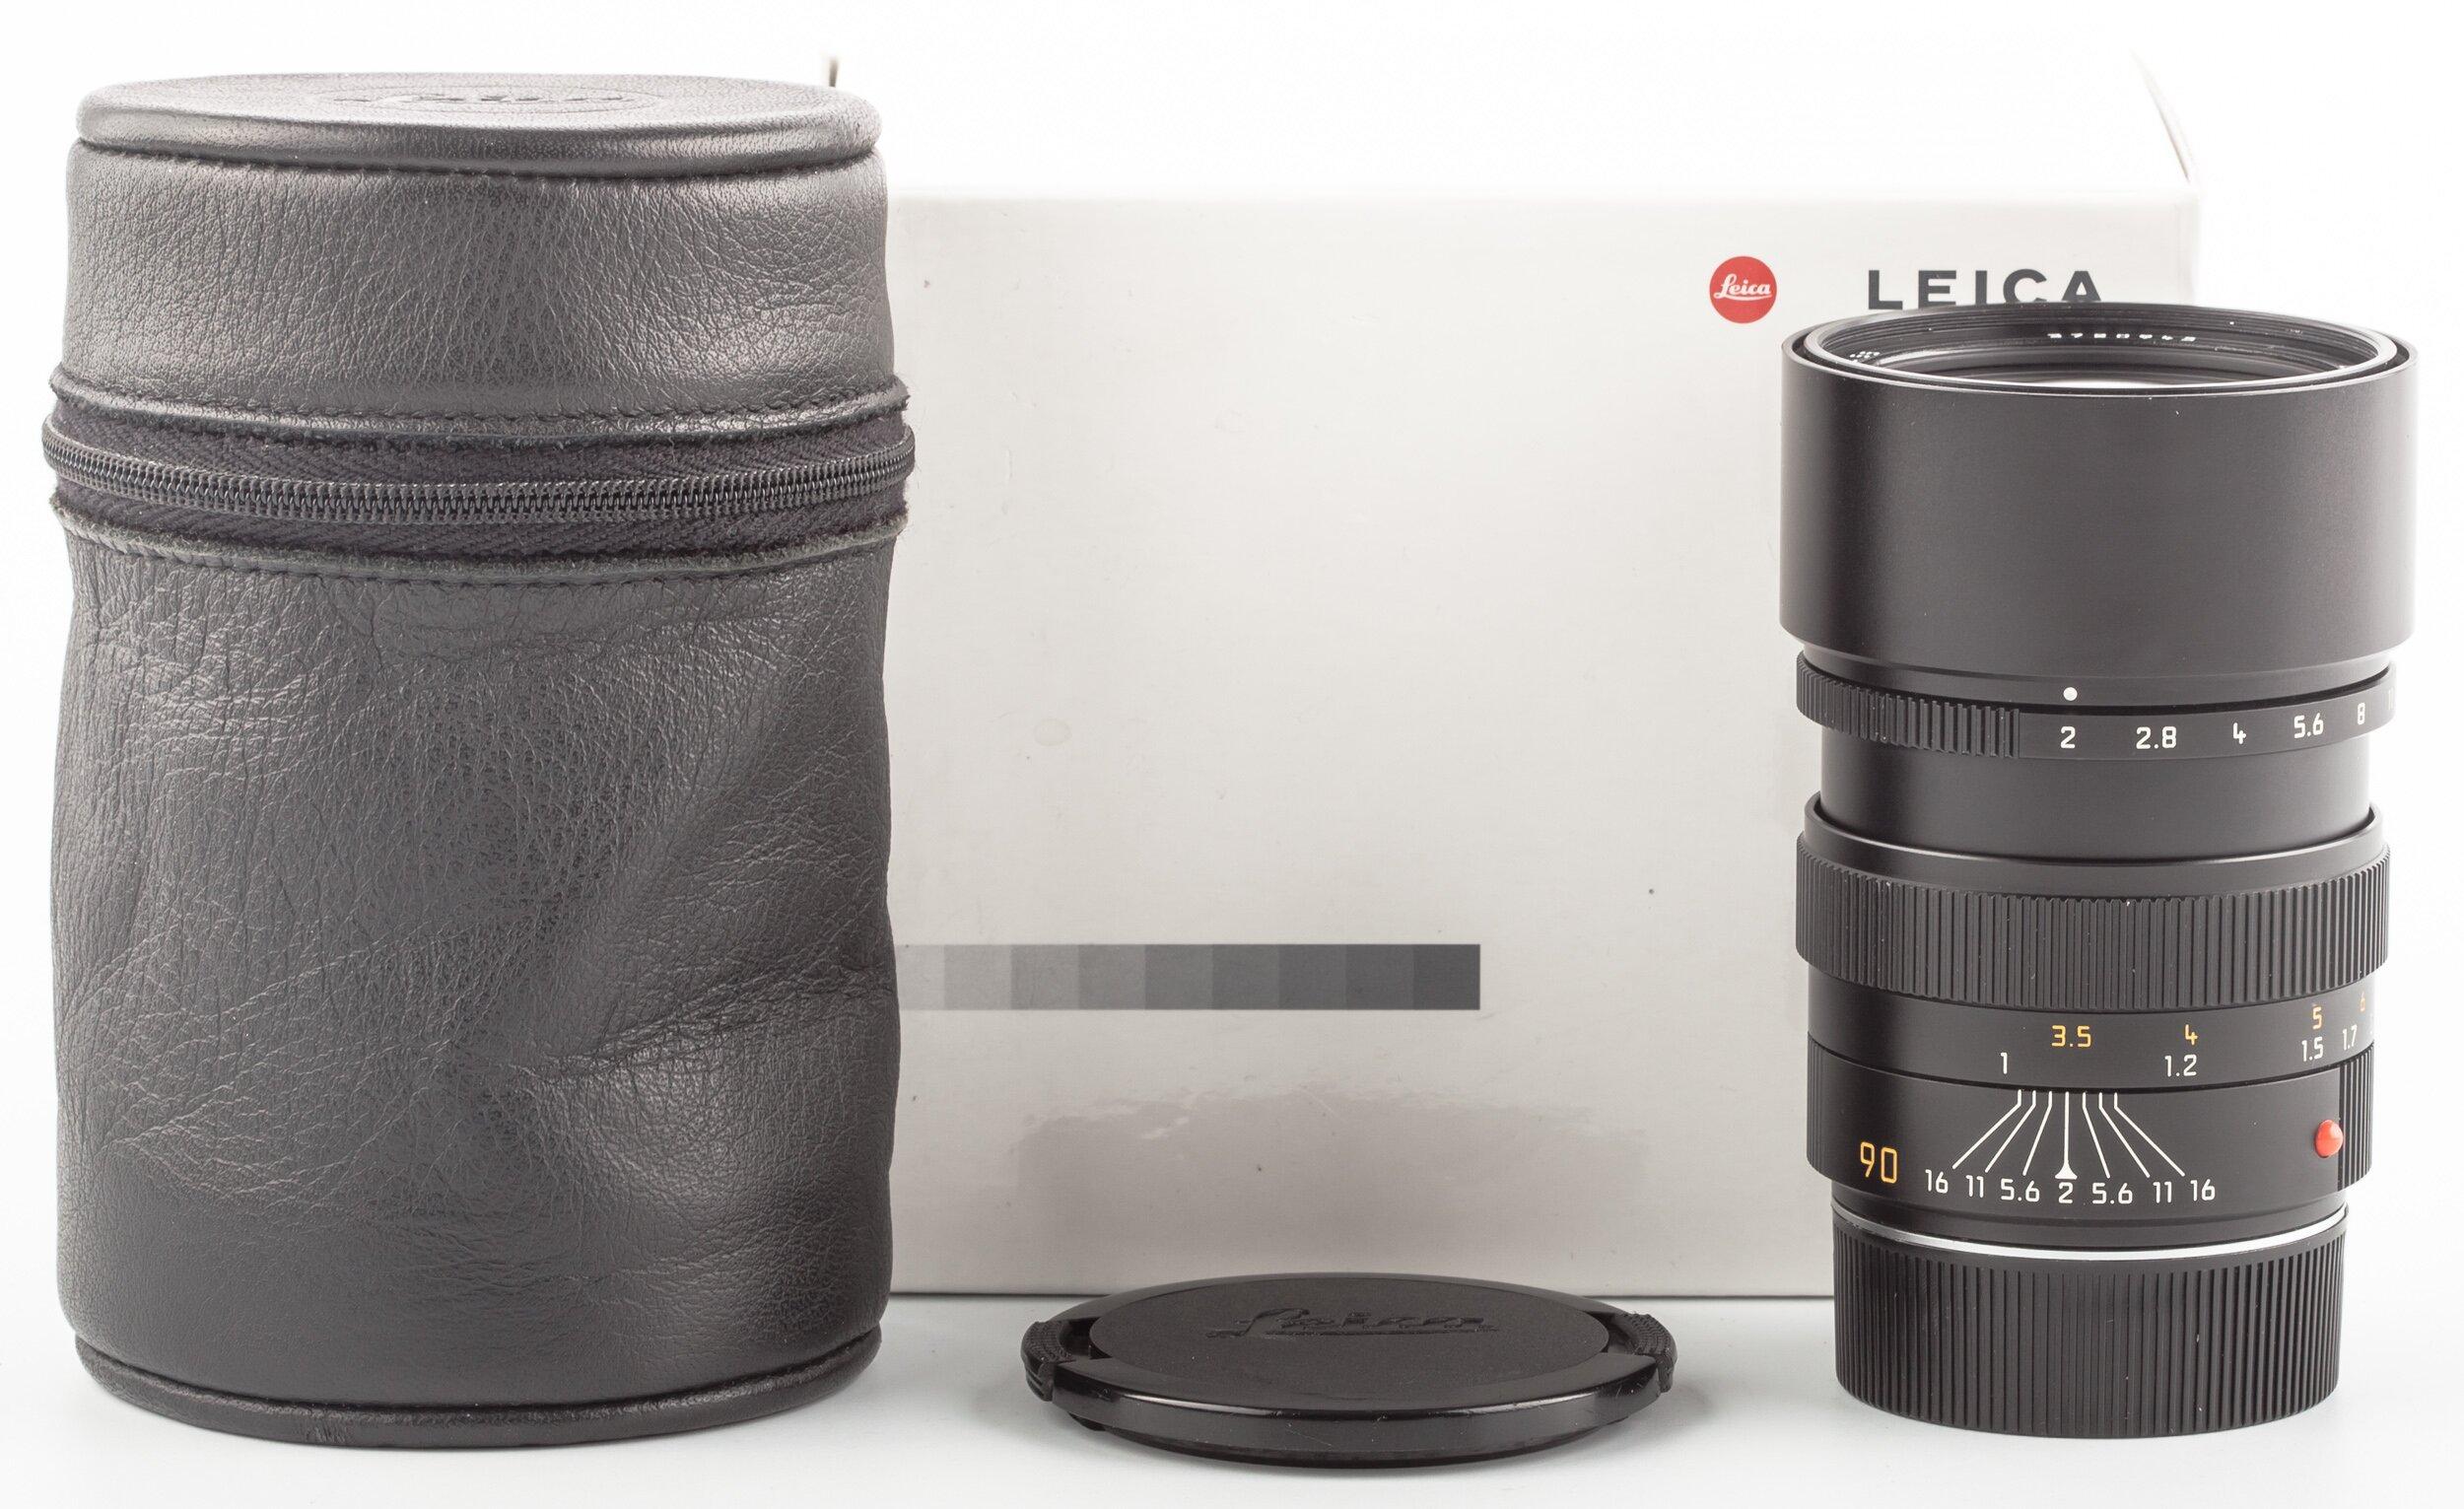 Leitz Leica M Summicron 90mm F2.0